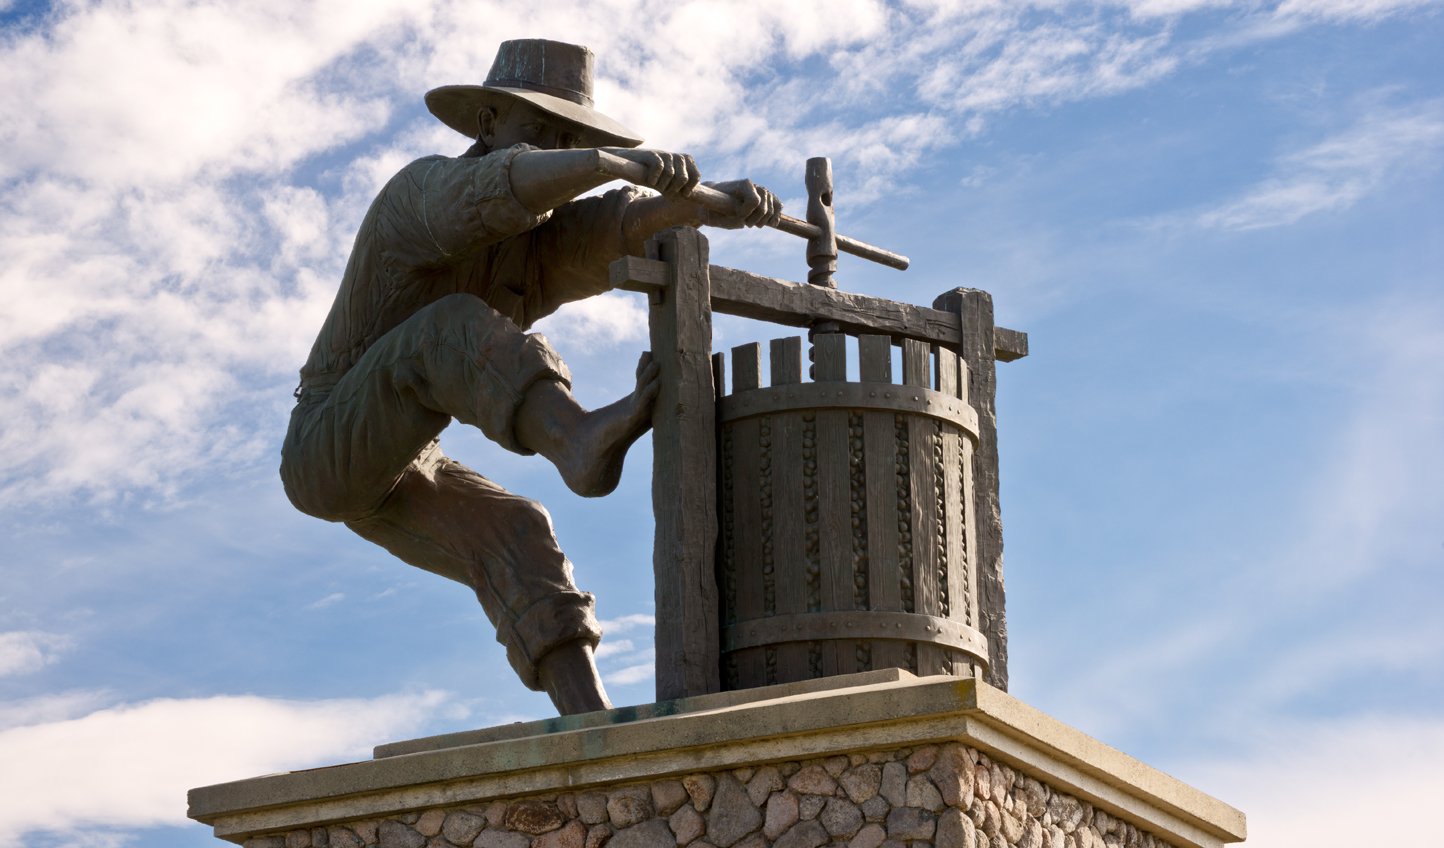 Winemaker-Statue-Napa_16190